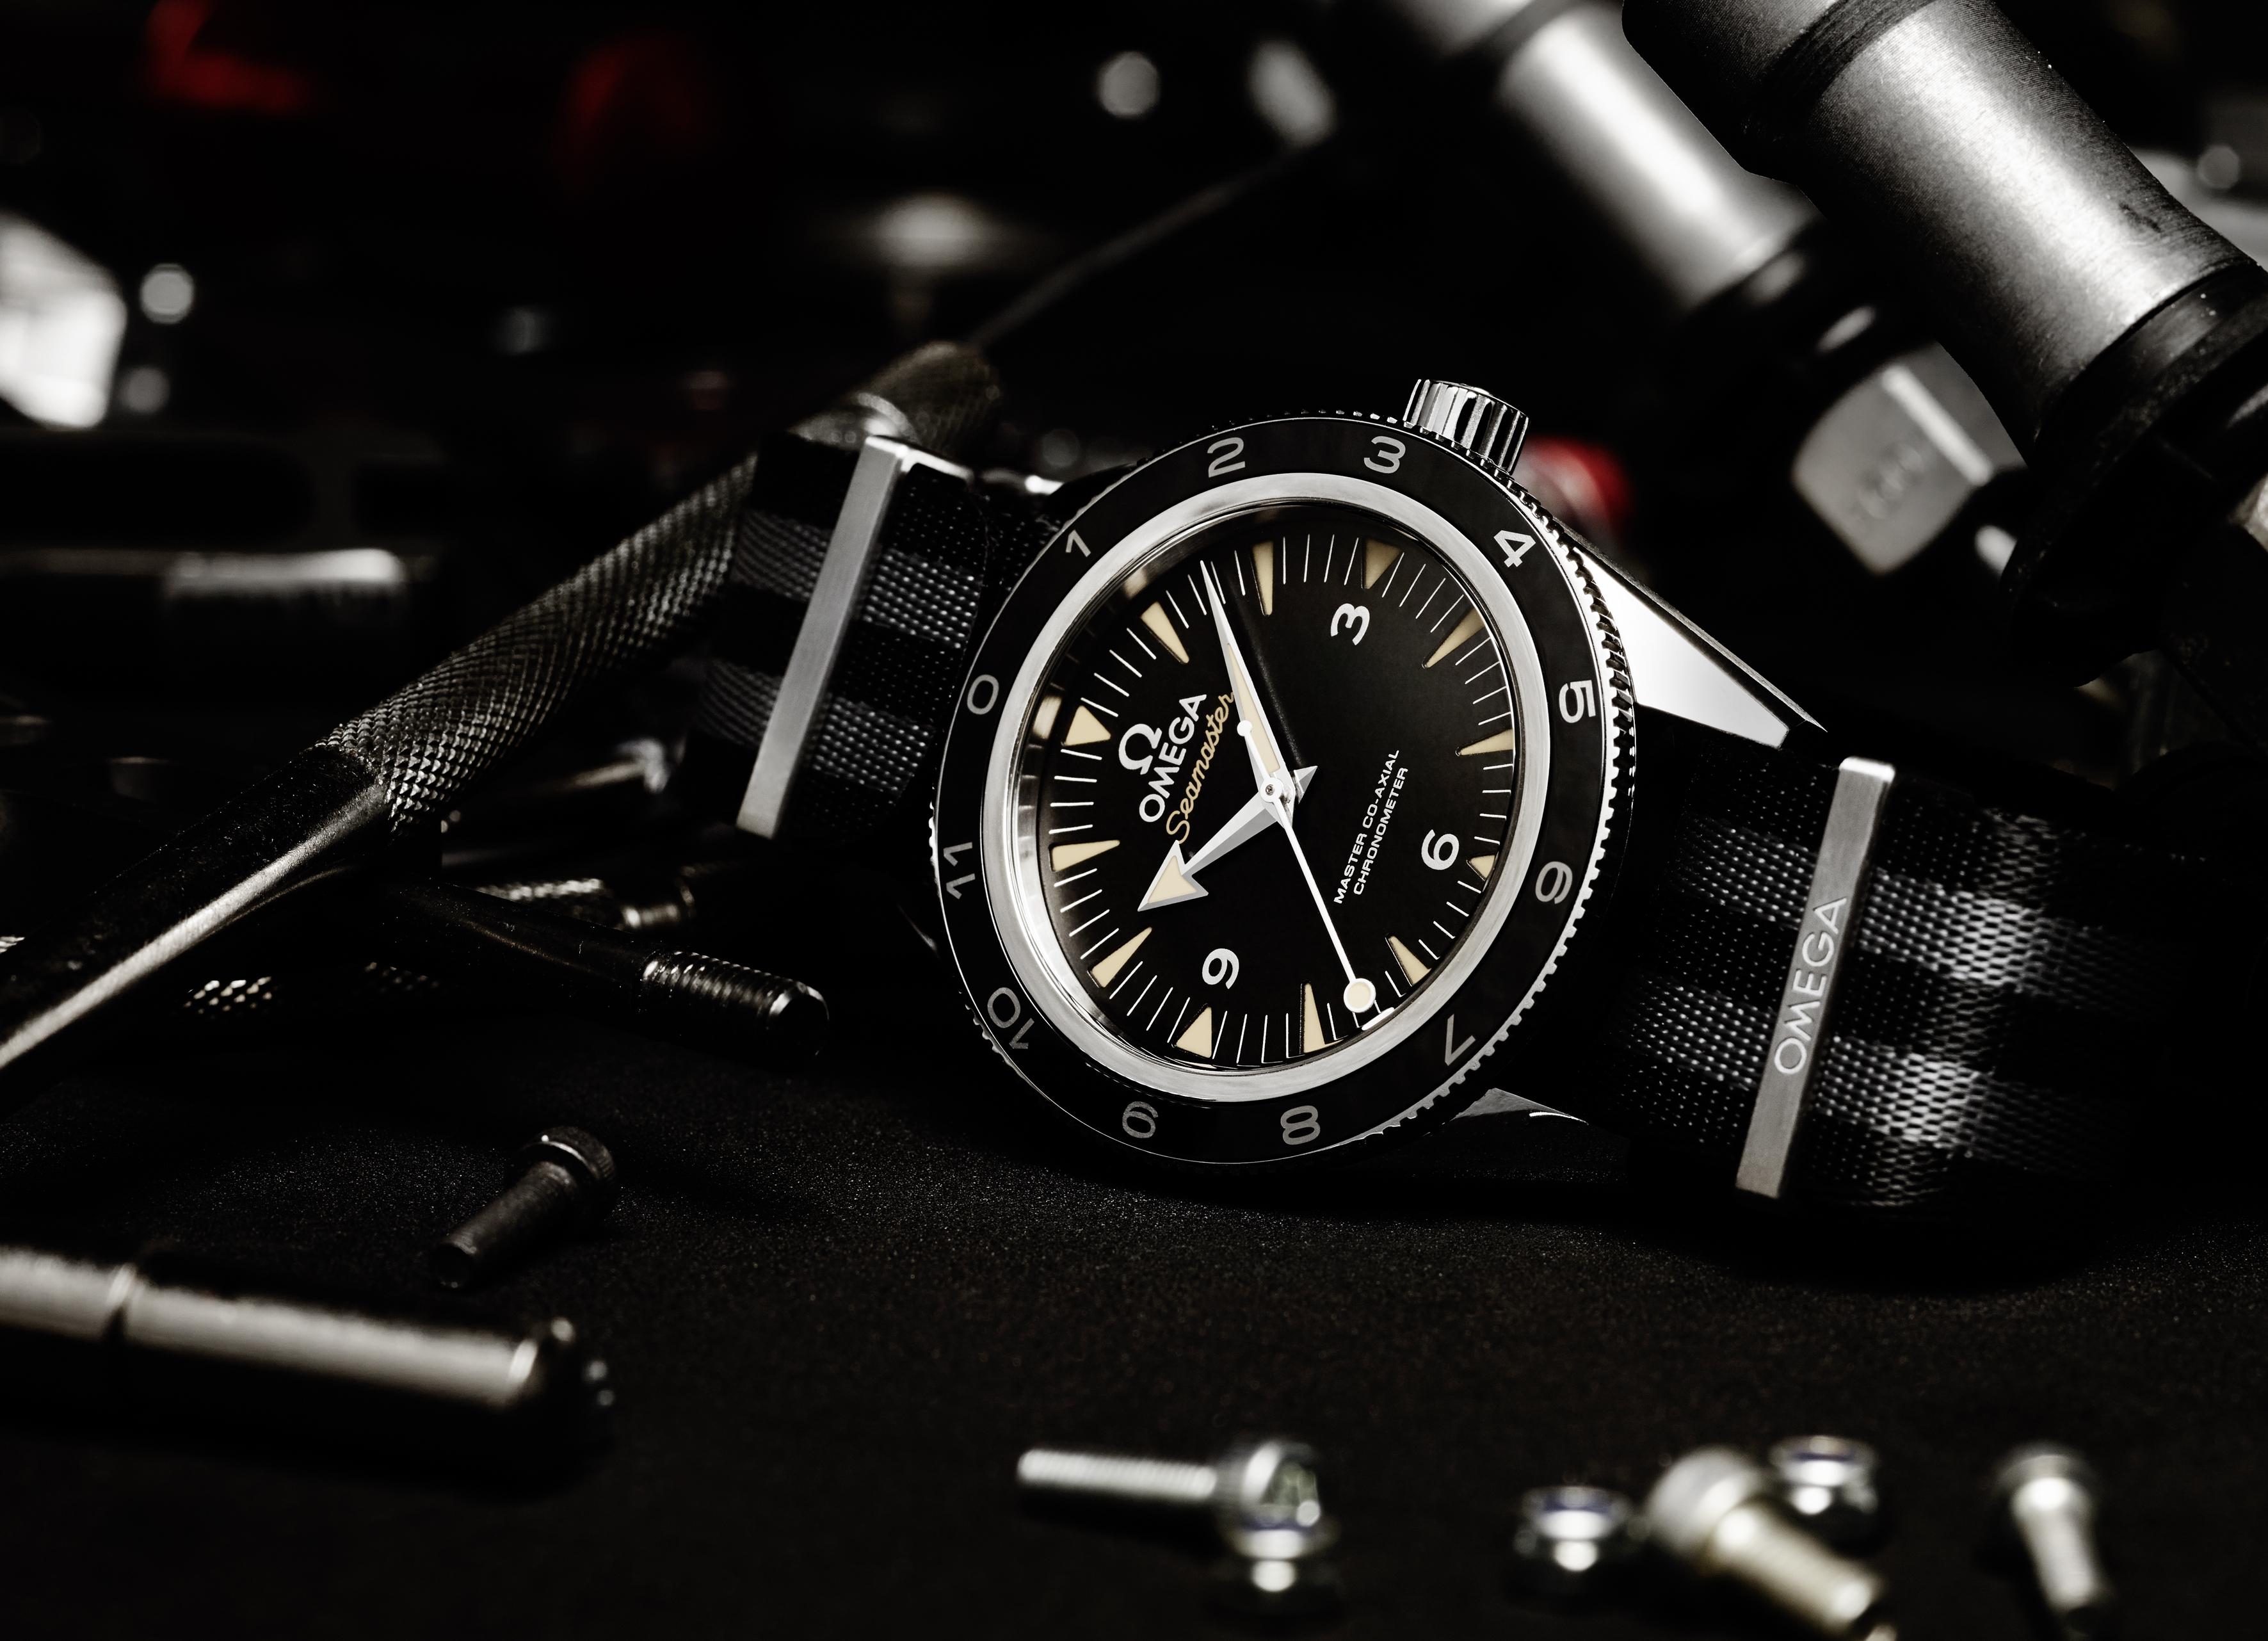 The_OMEGA_Seamaster_300_Bond_233_32_41_21_01_001